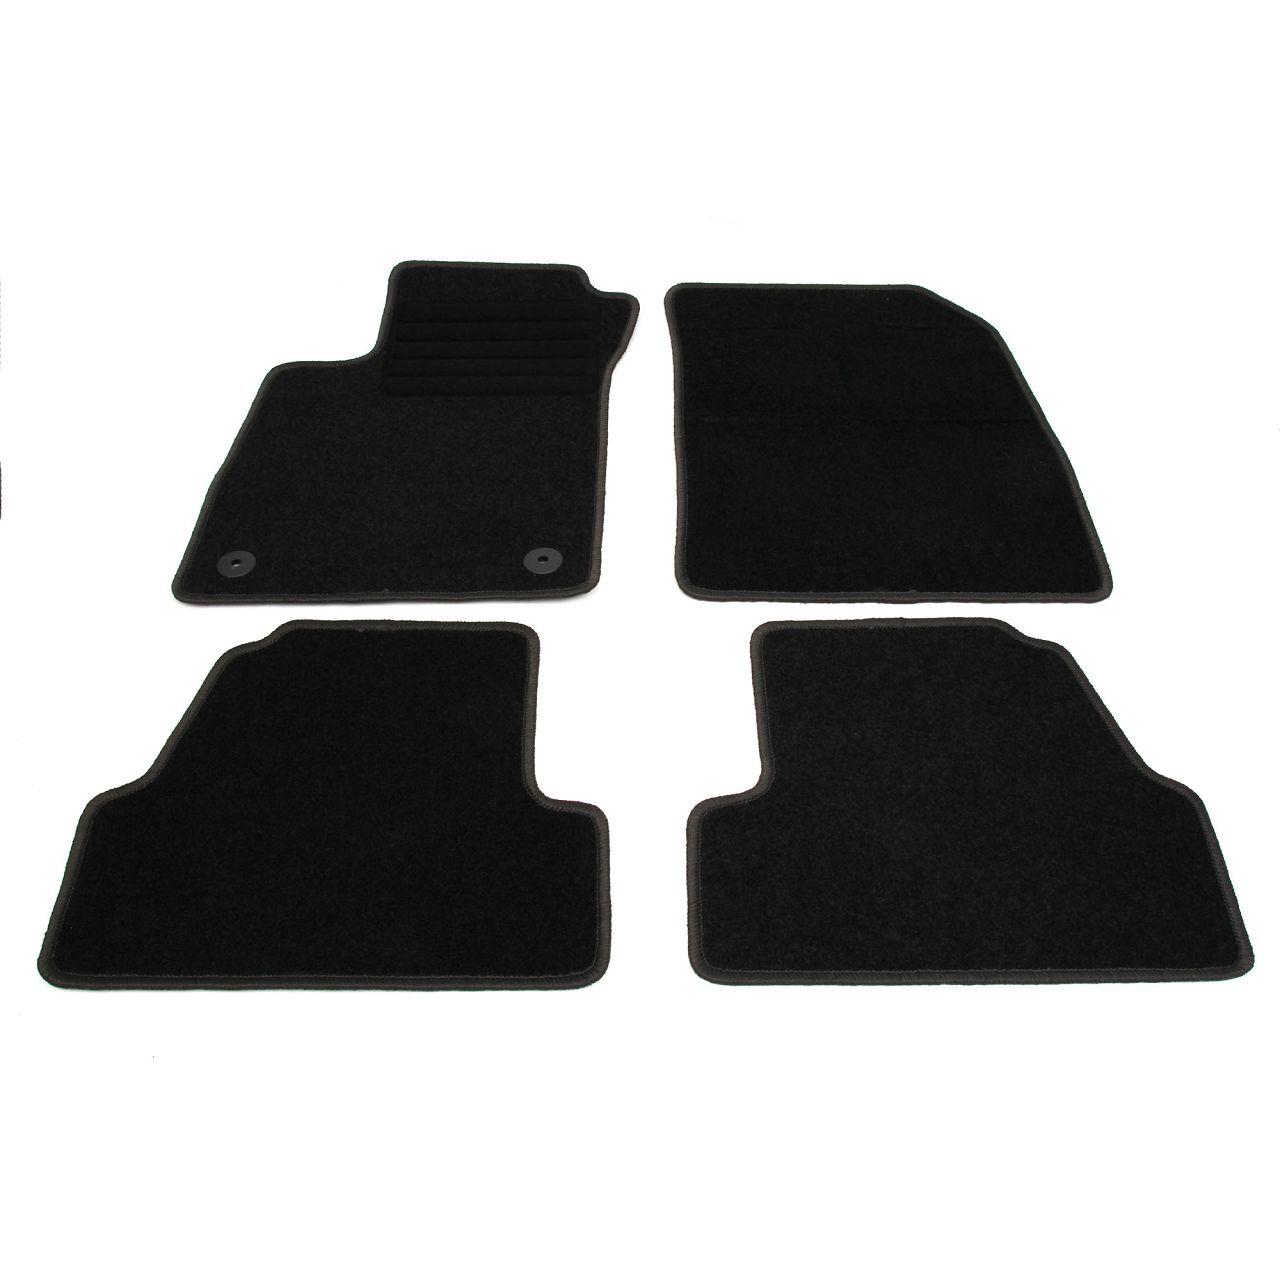 Veloursmatten Textilmatten Fußmatten Satz für OPEL MOKKA / MOKKA X 4-tlg